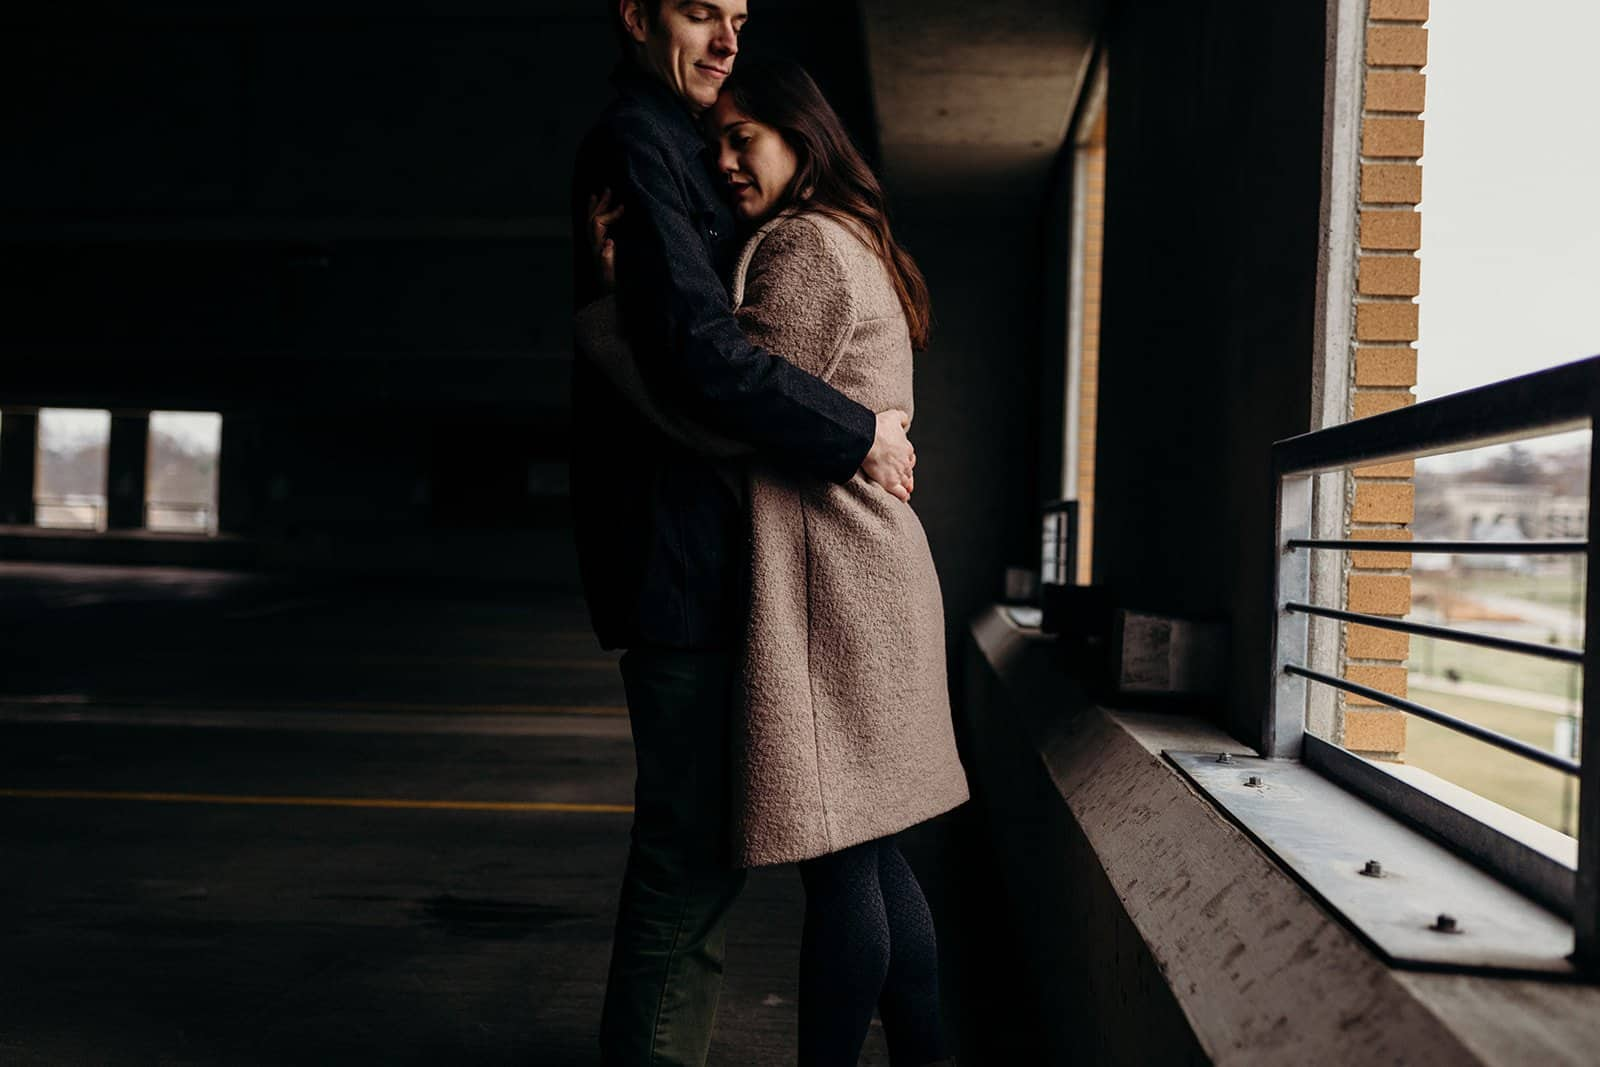 Kent Ohio engaged couple hug in parking garage